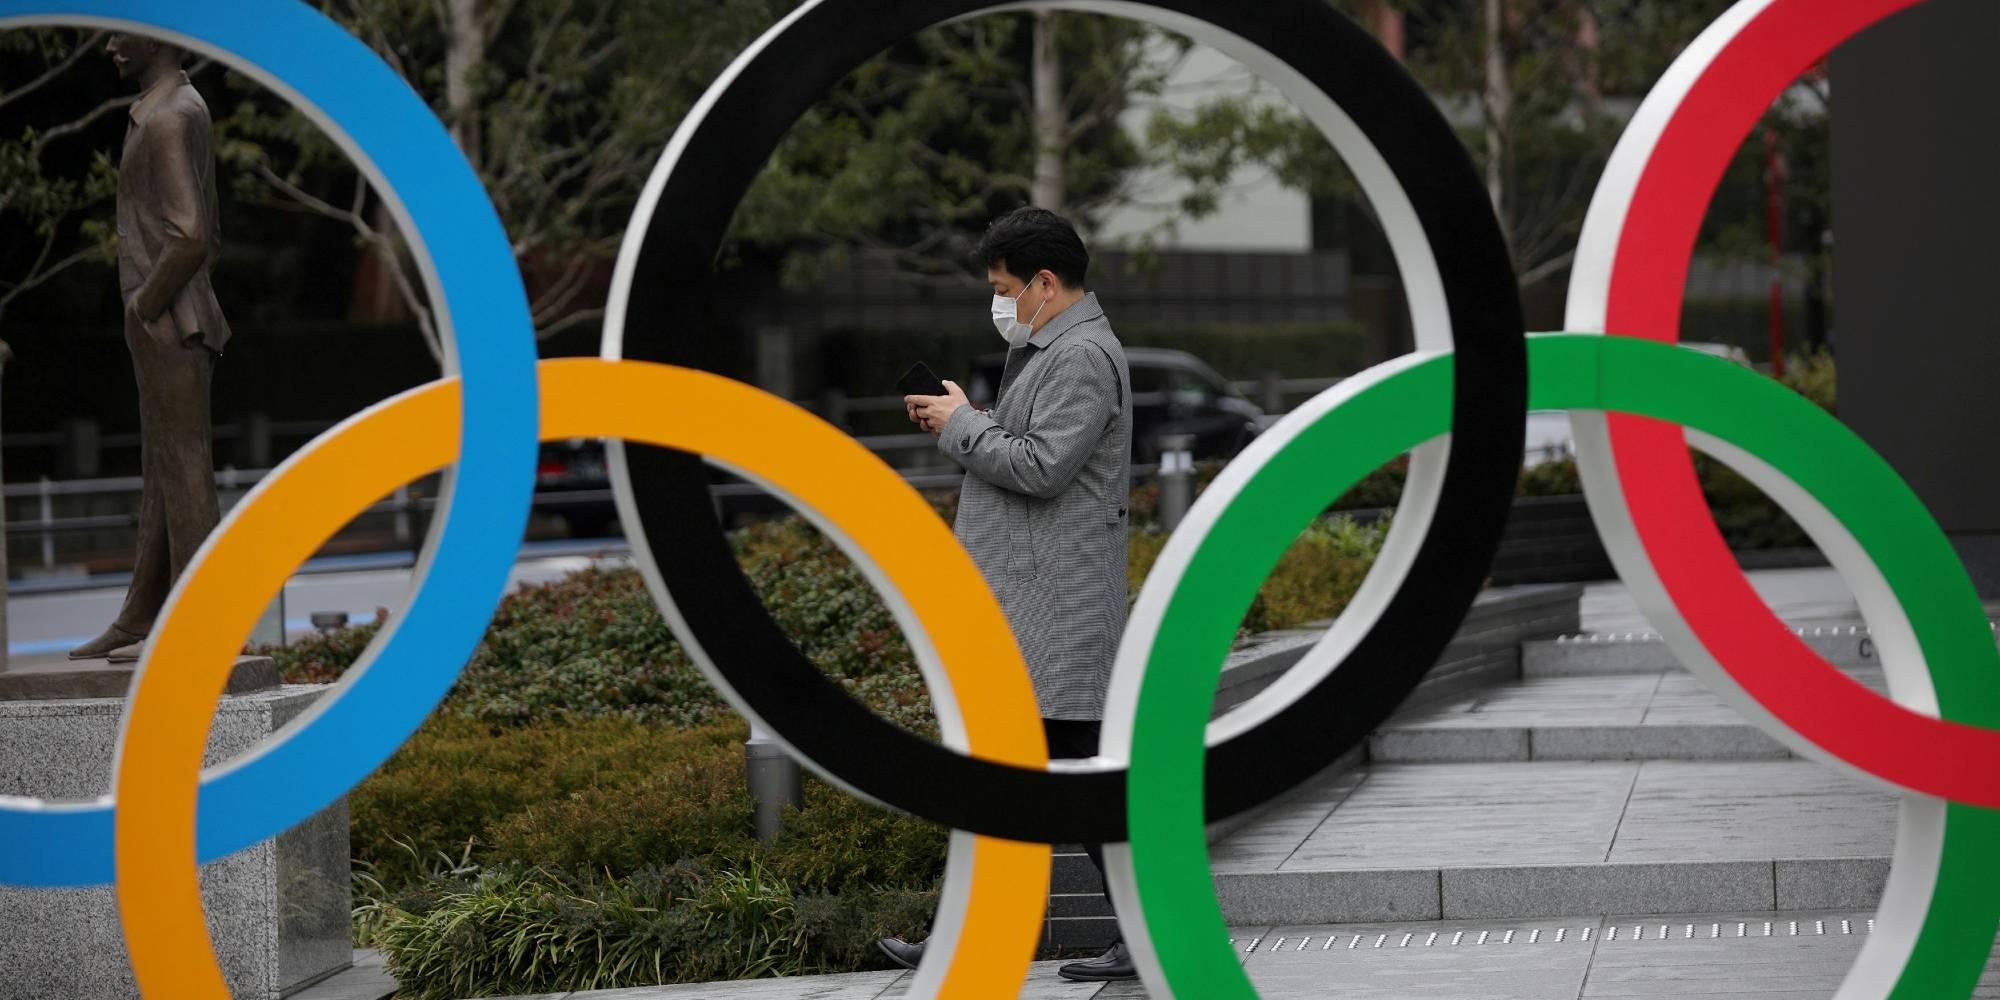 juegos olímpicos extranjero   Business Insider Mexico